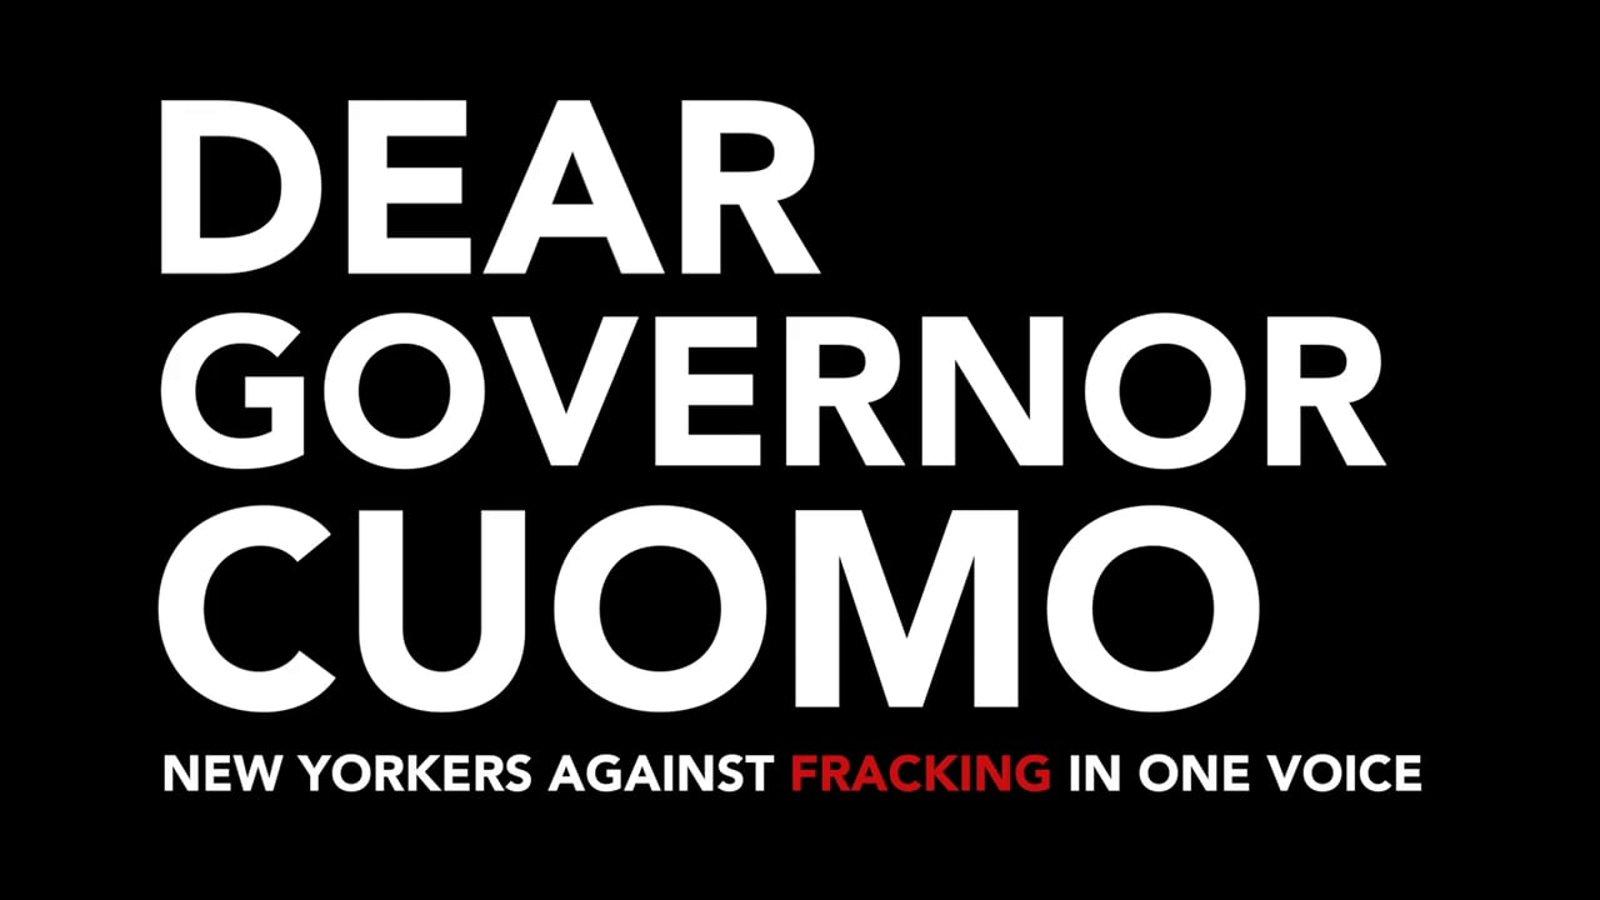 Dear Governor Cuomo - Fracking in New York